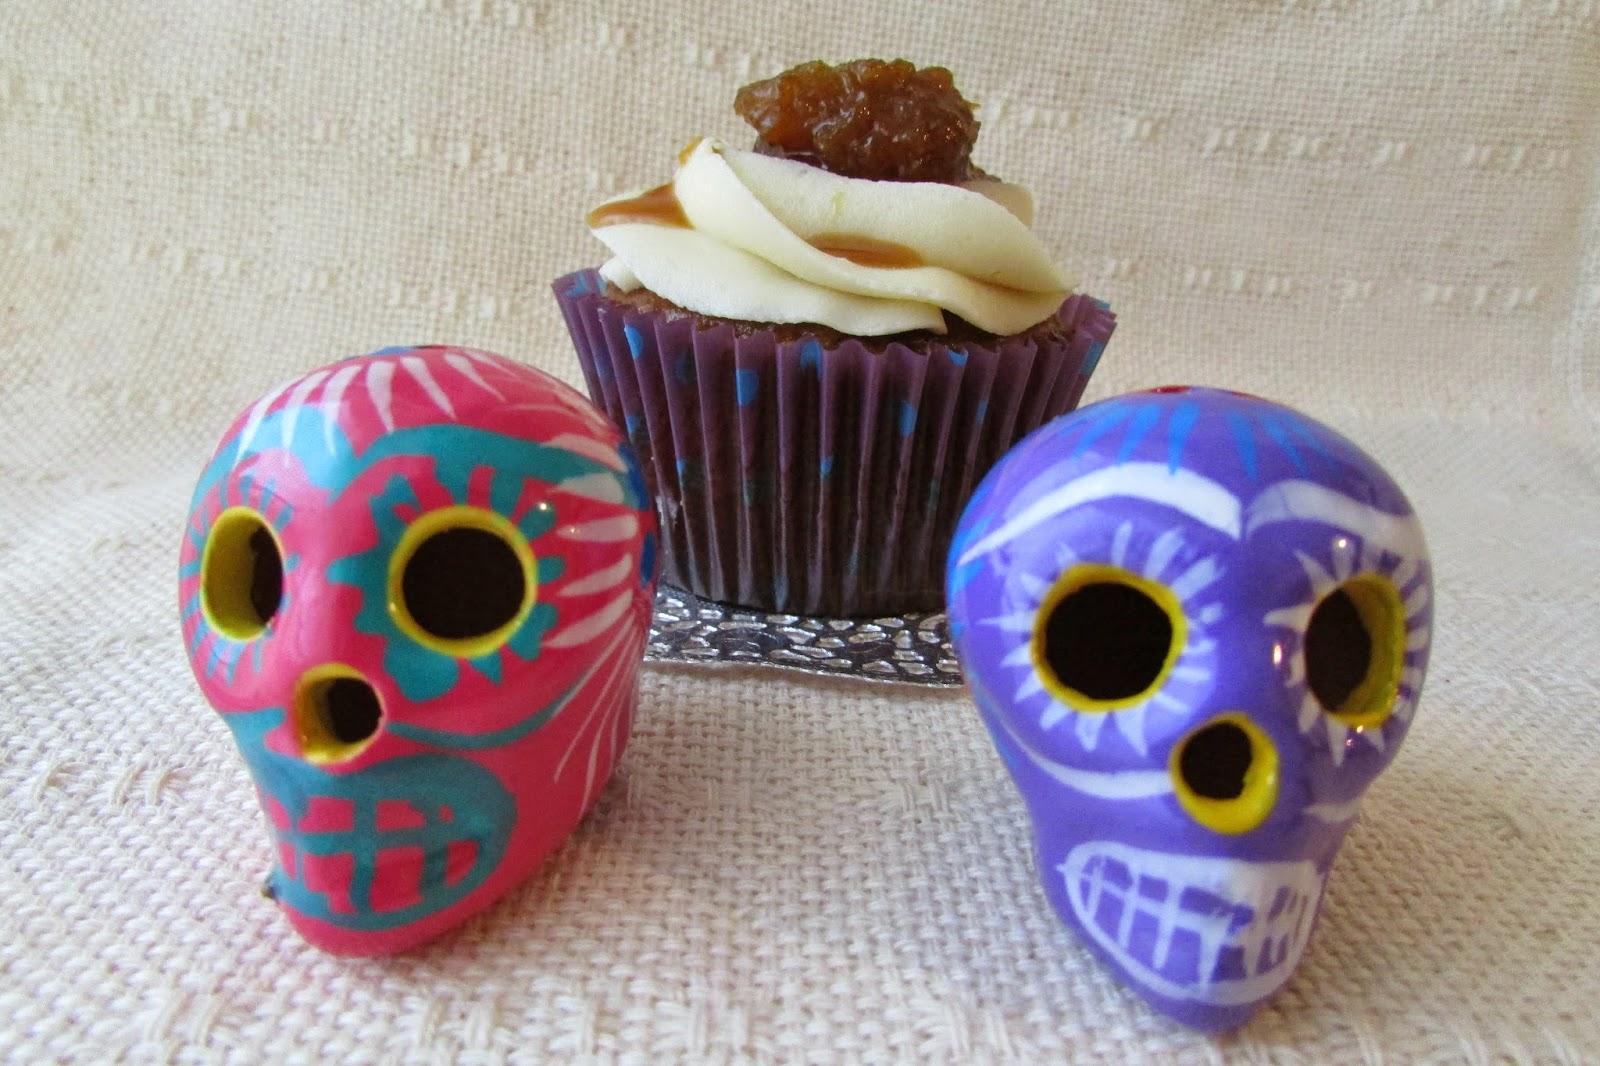 cupcake-dia-de-muertos-mexico